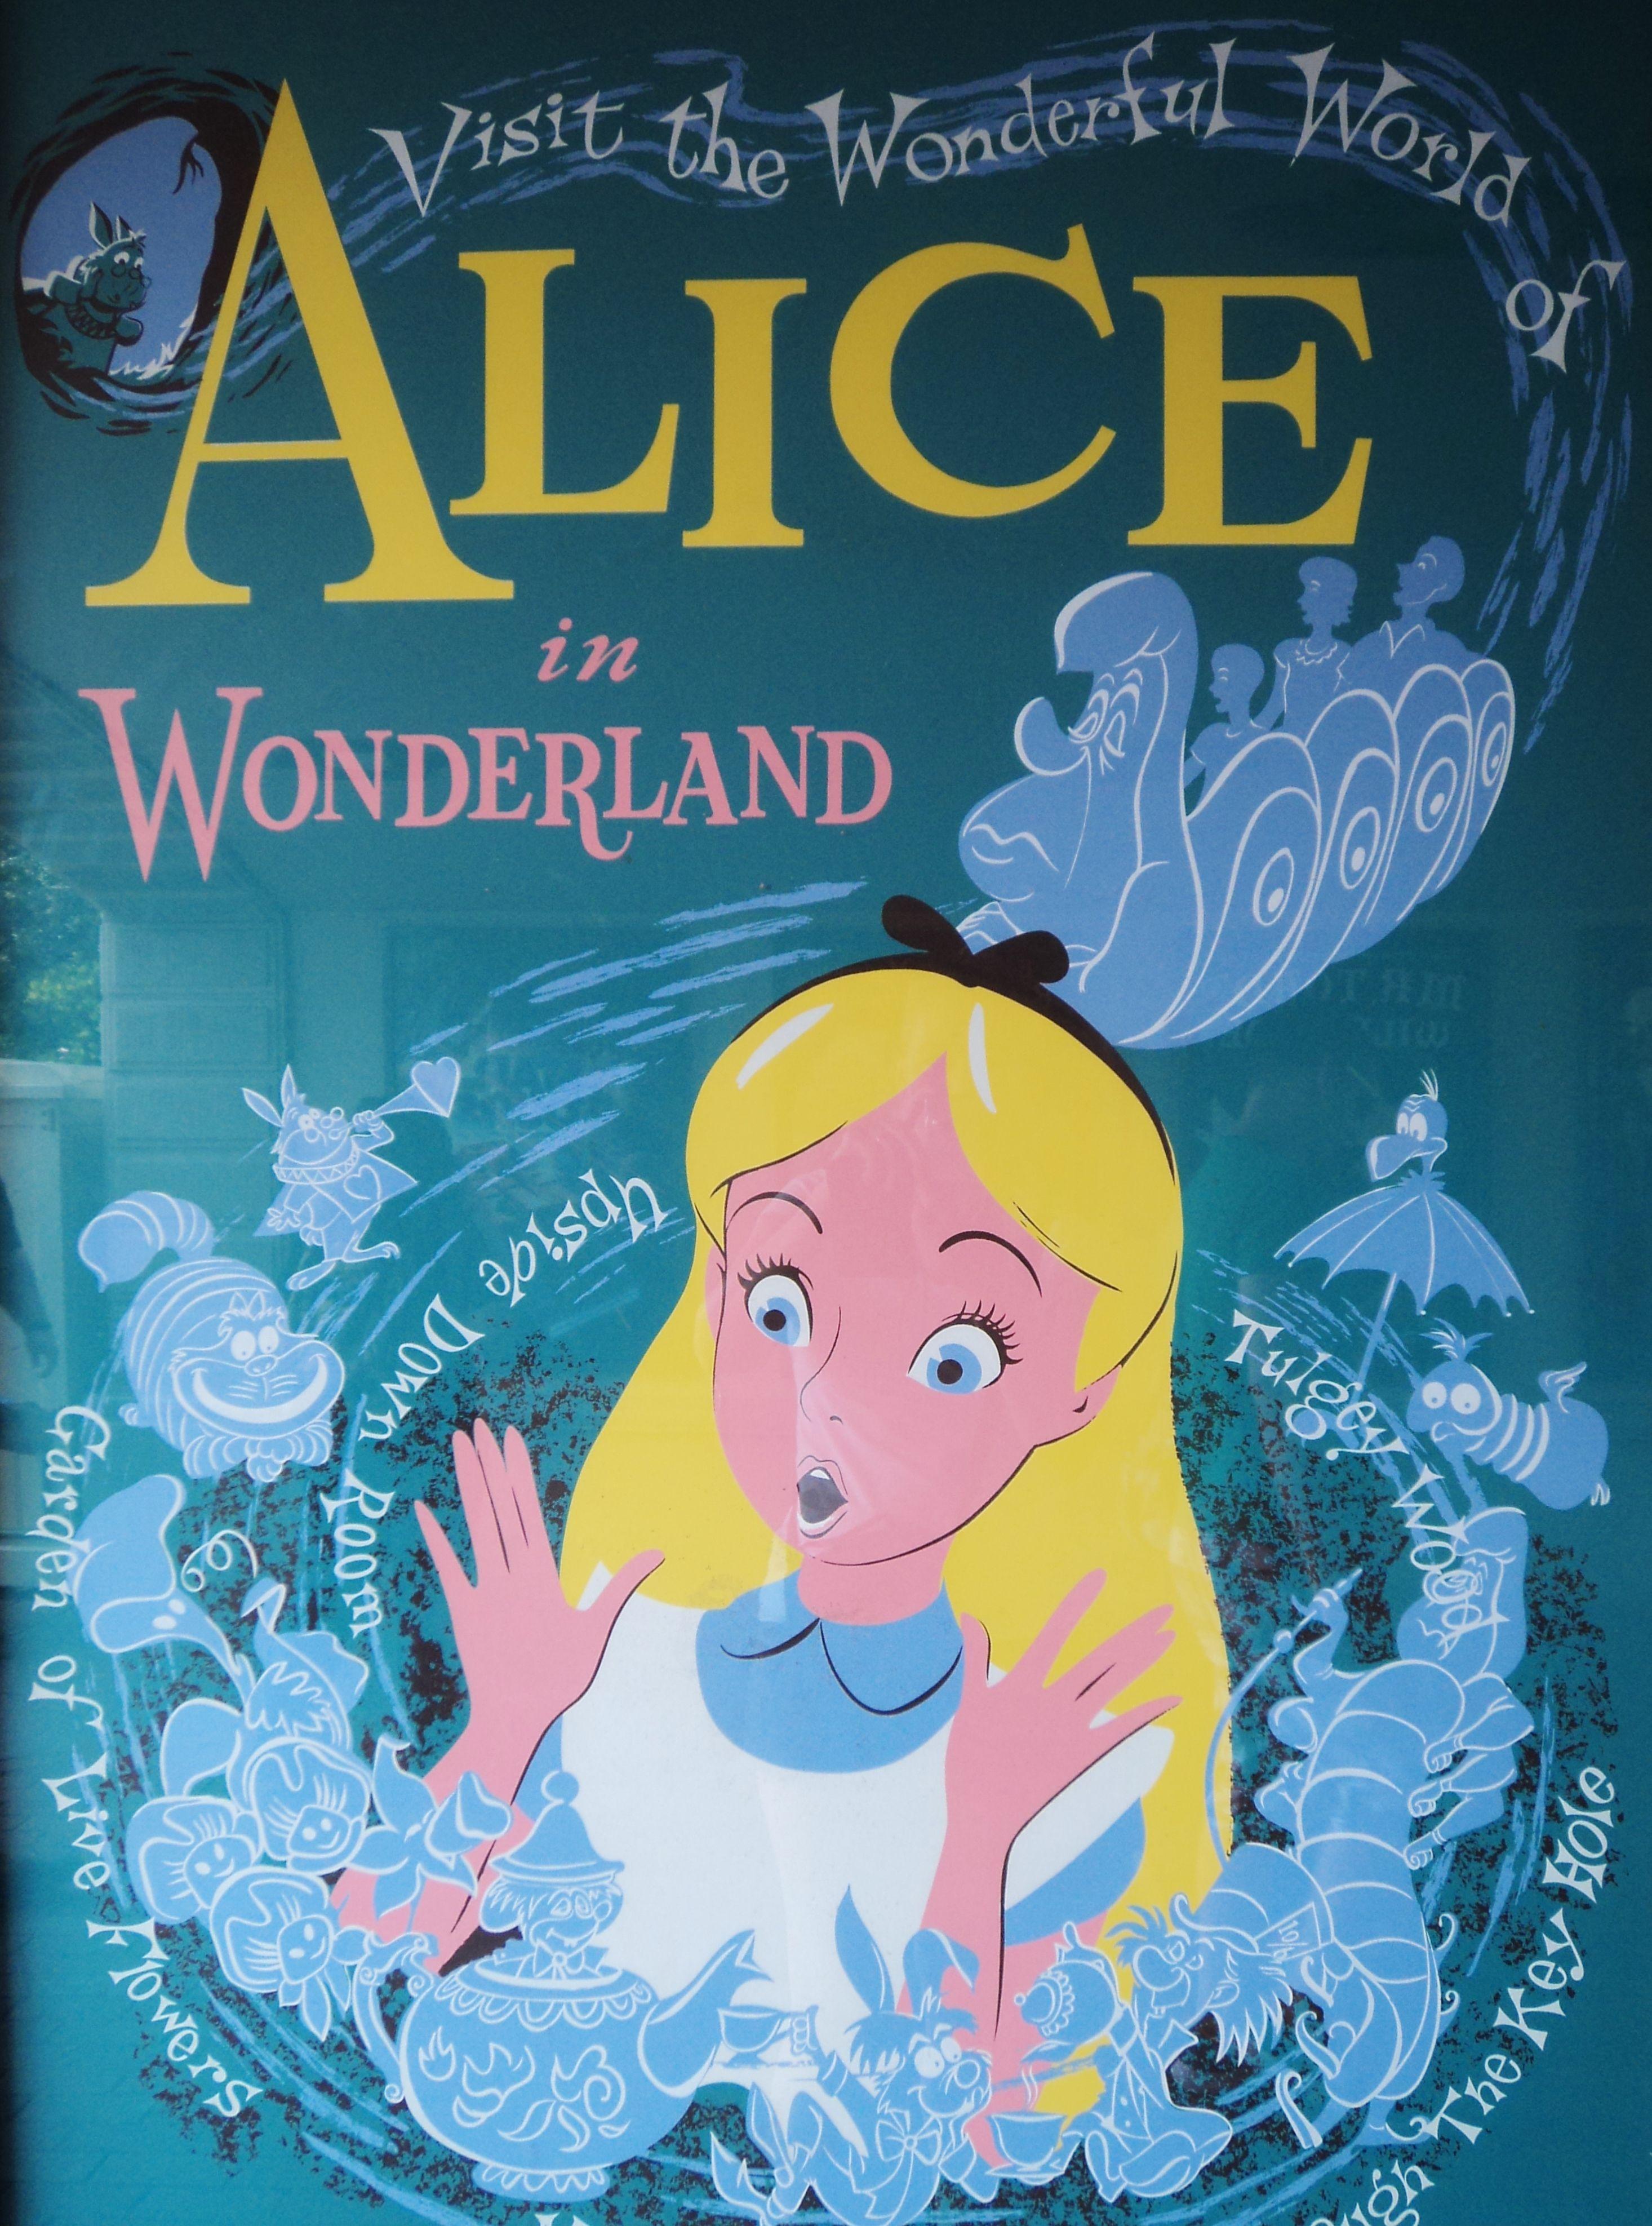 ALICE in WONDERLAND,1951, poster art | Back in the day | Pinterest